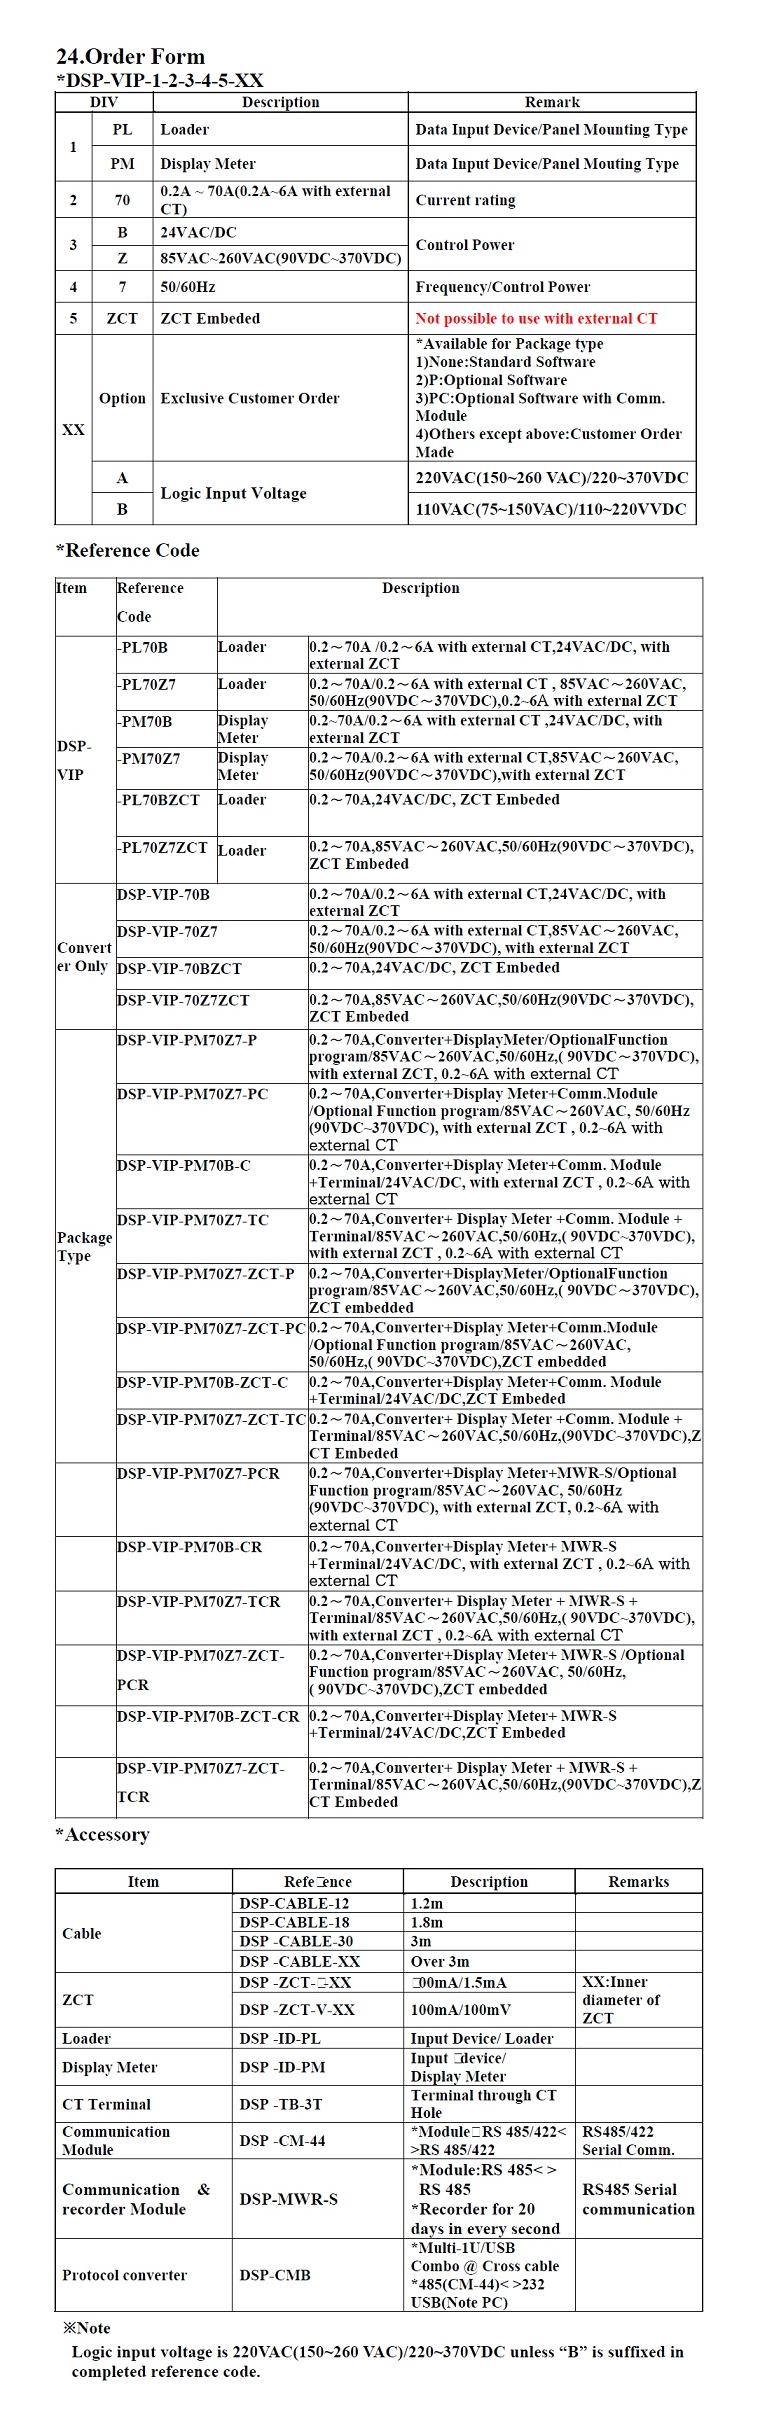 SamWha DSP Power Type,GF,Temp,Short + PC comm.,Pre-maintenance DSP-VIP-PM 3